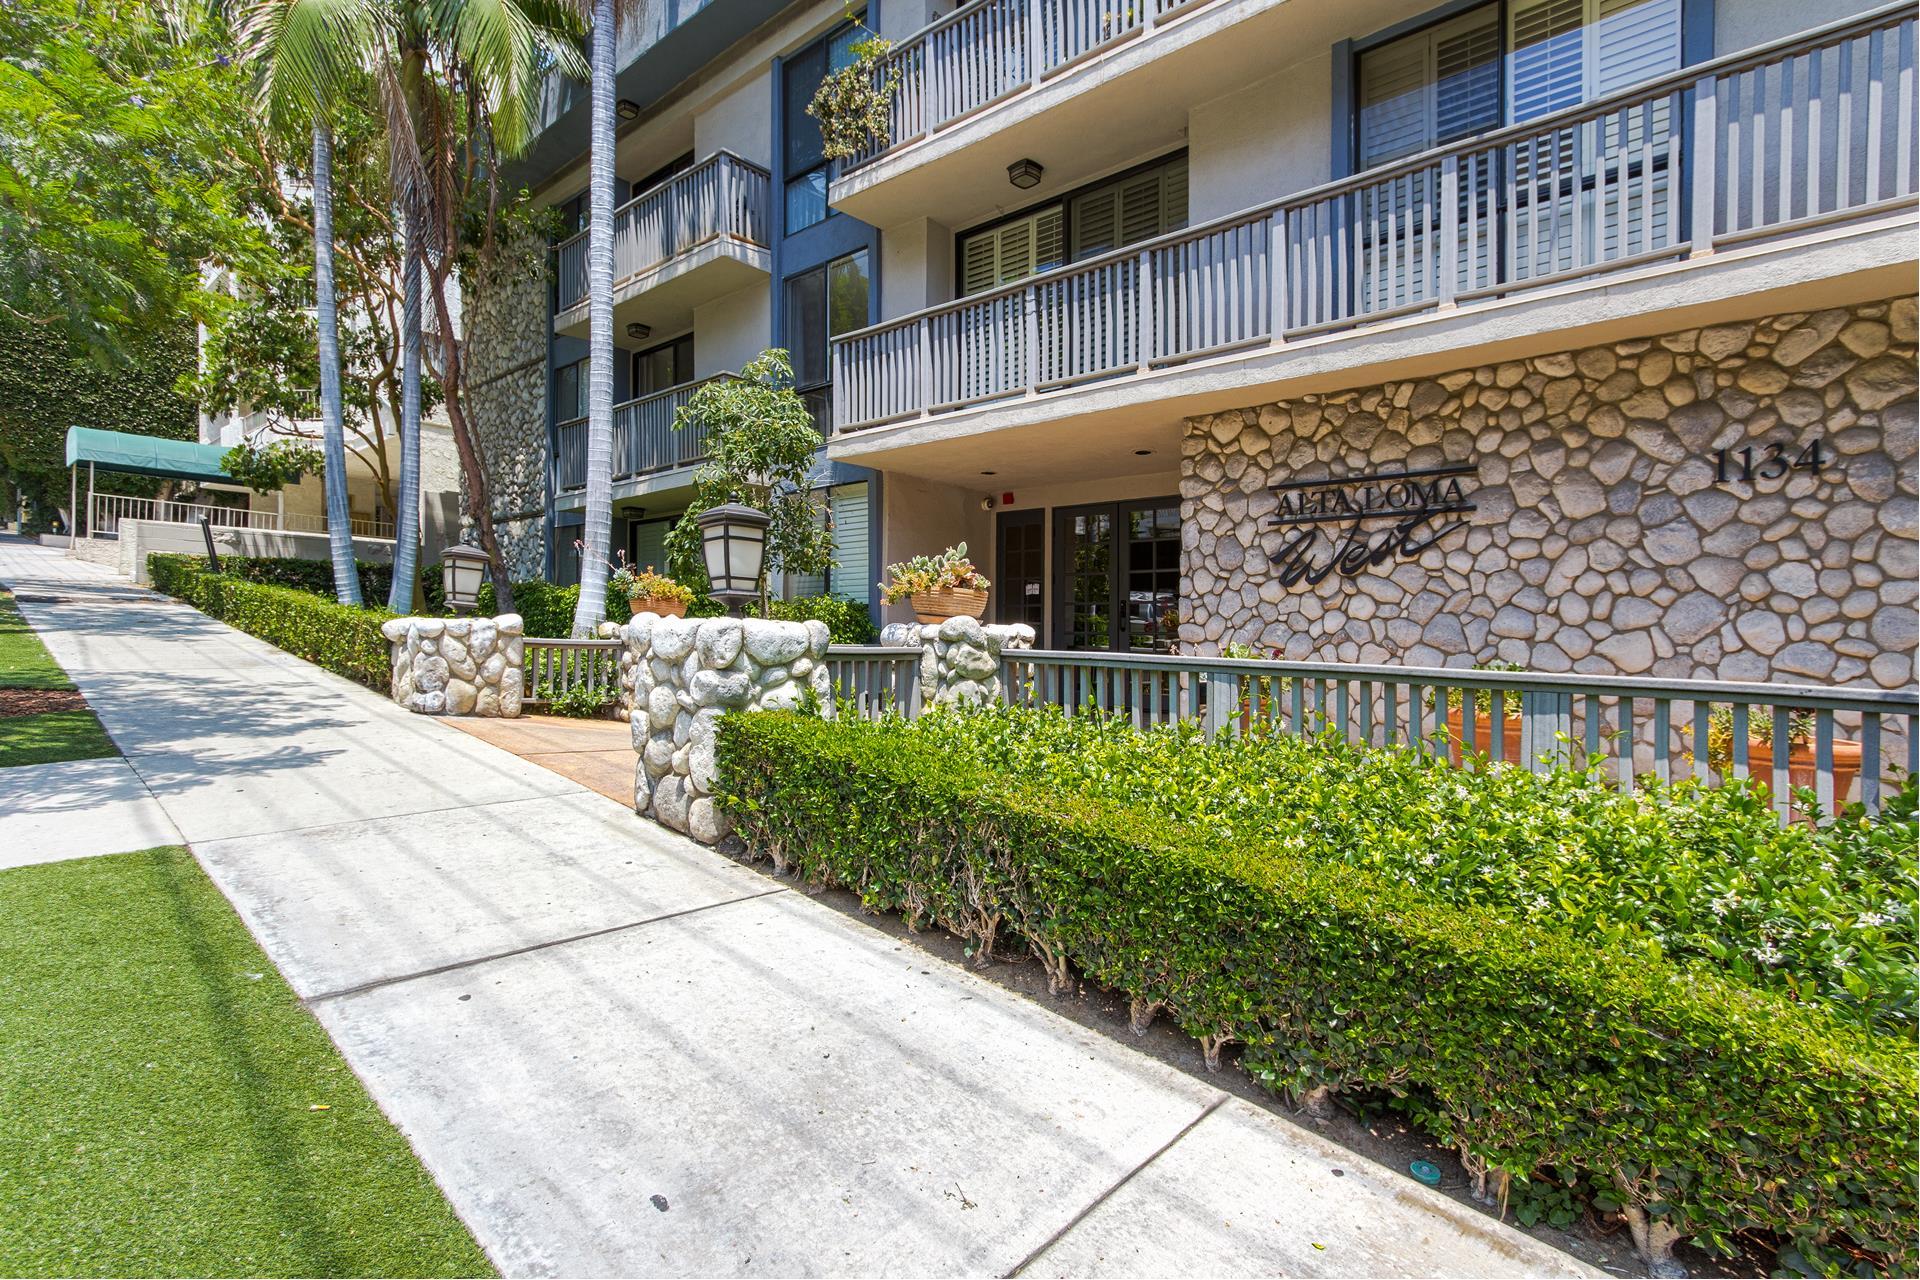 1134 ALTA LOMA Road, 214 - West Hollywood, California